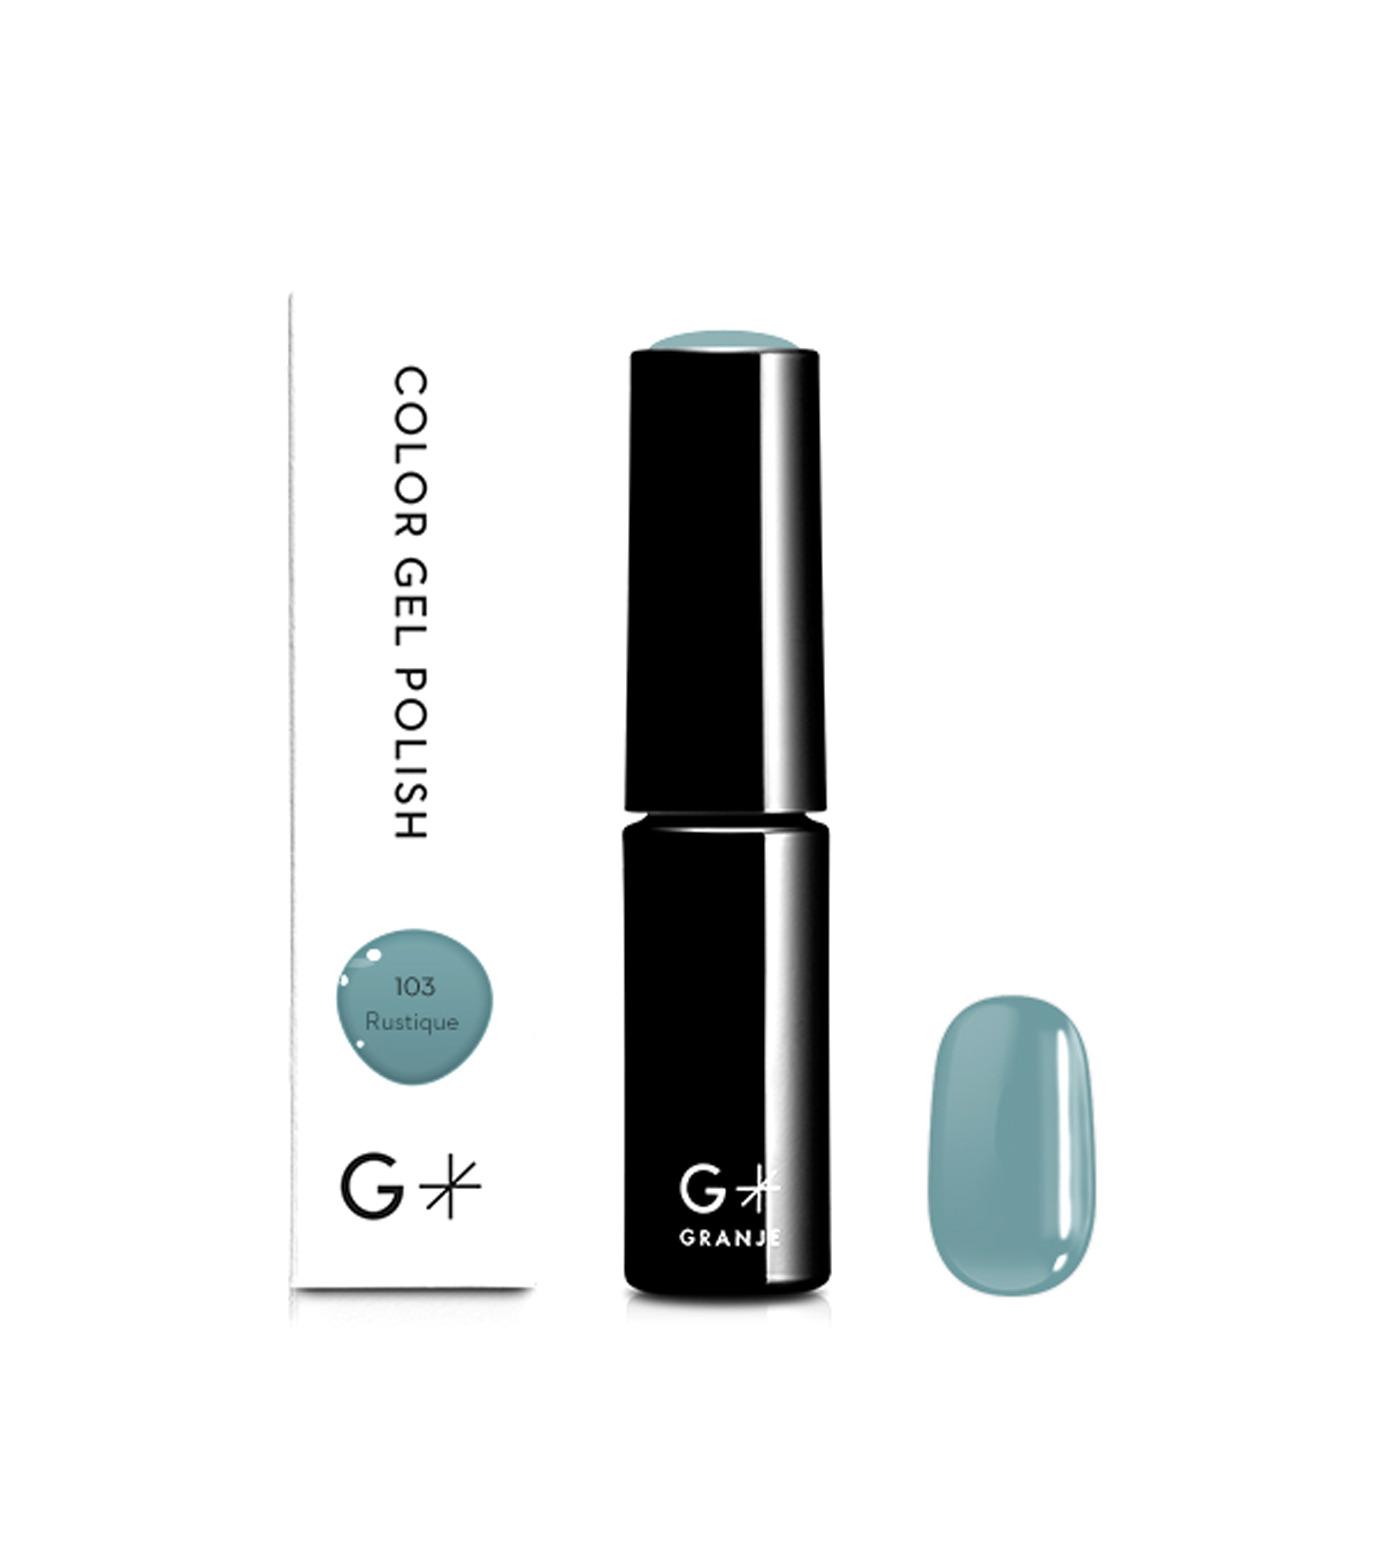 GRANJE(グランジェ)のRustique-INDIGO(MAKE-UP/MAKE-UP)-103-94 拡大詳細画像1